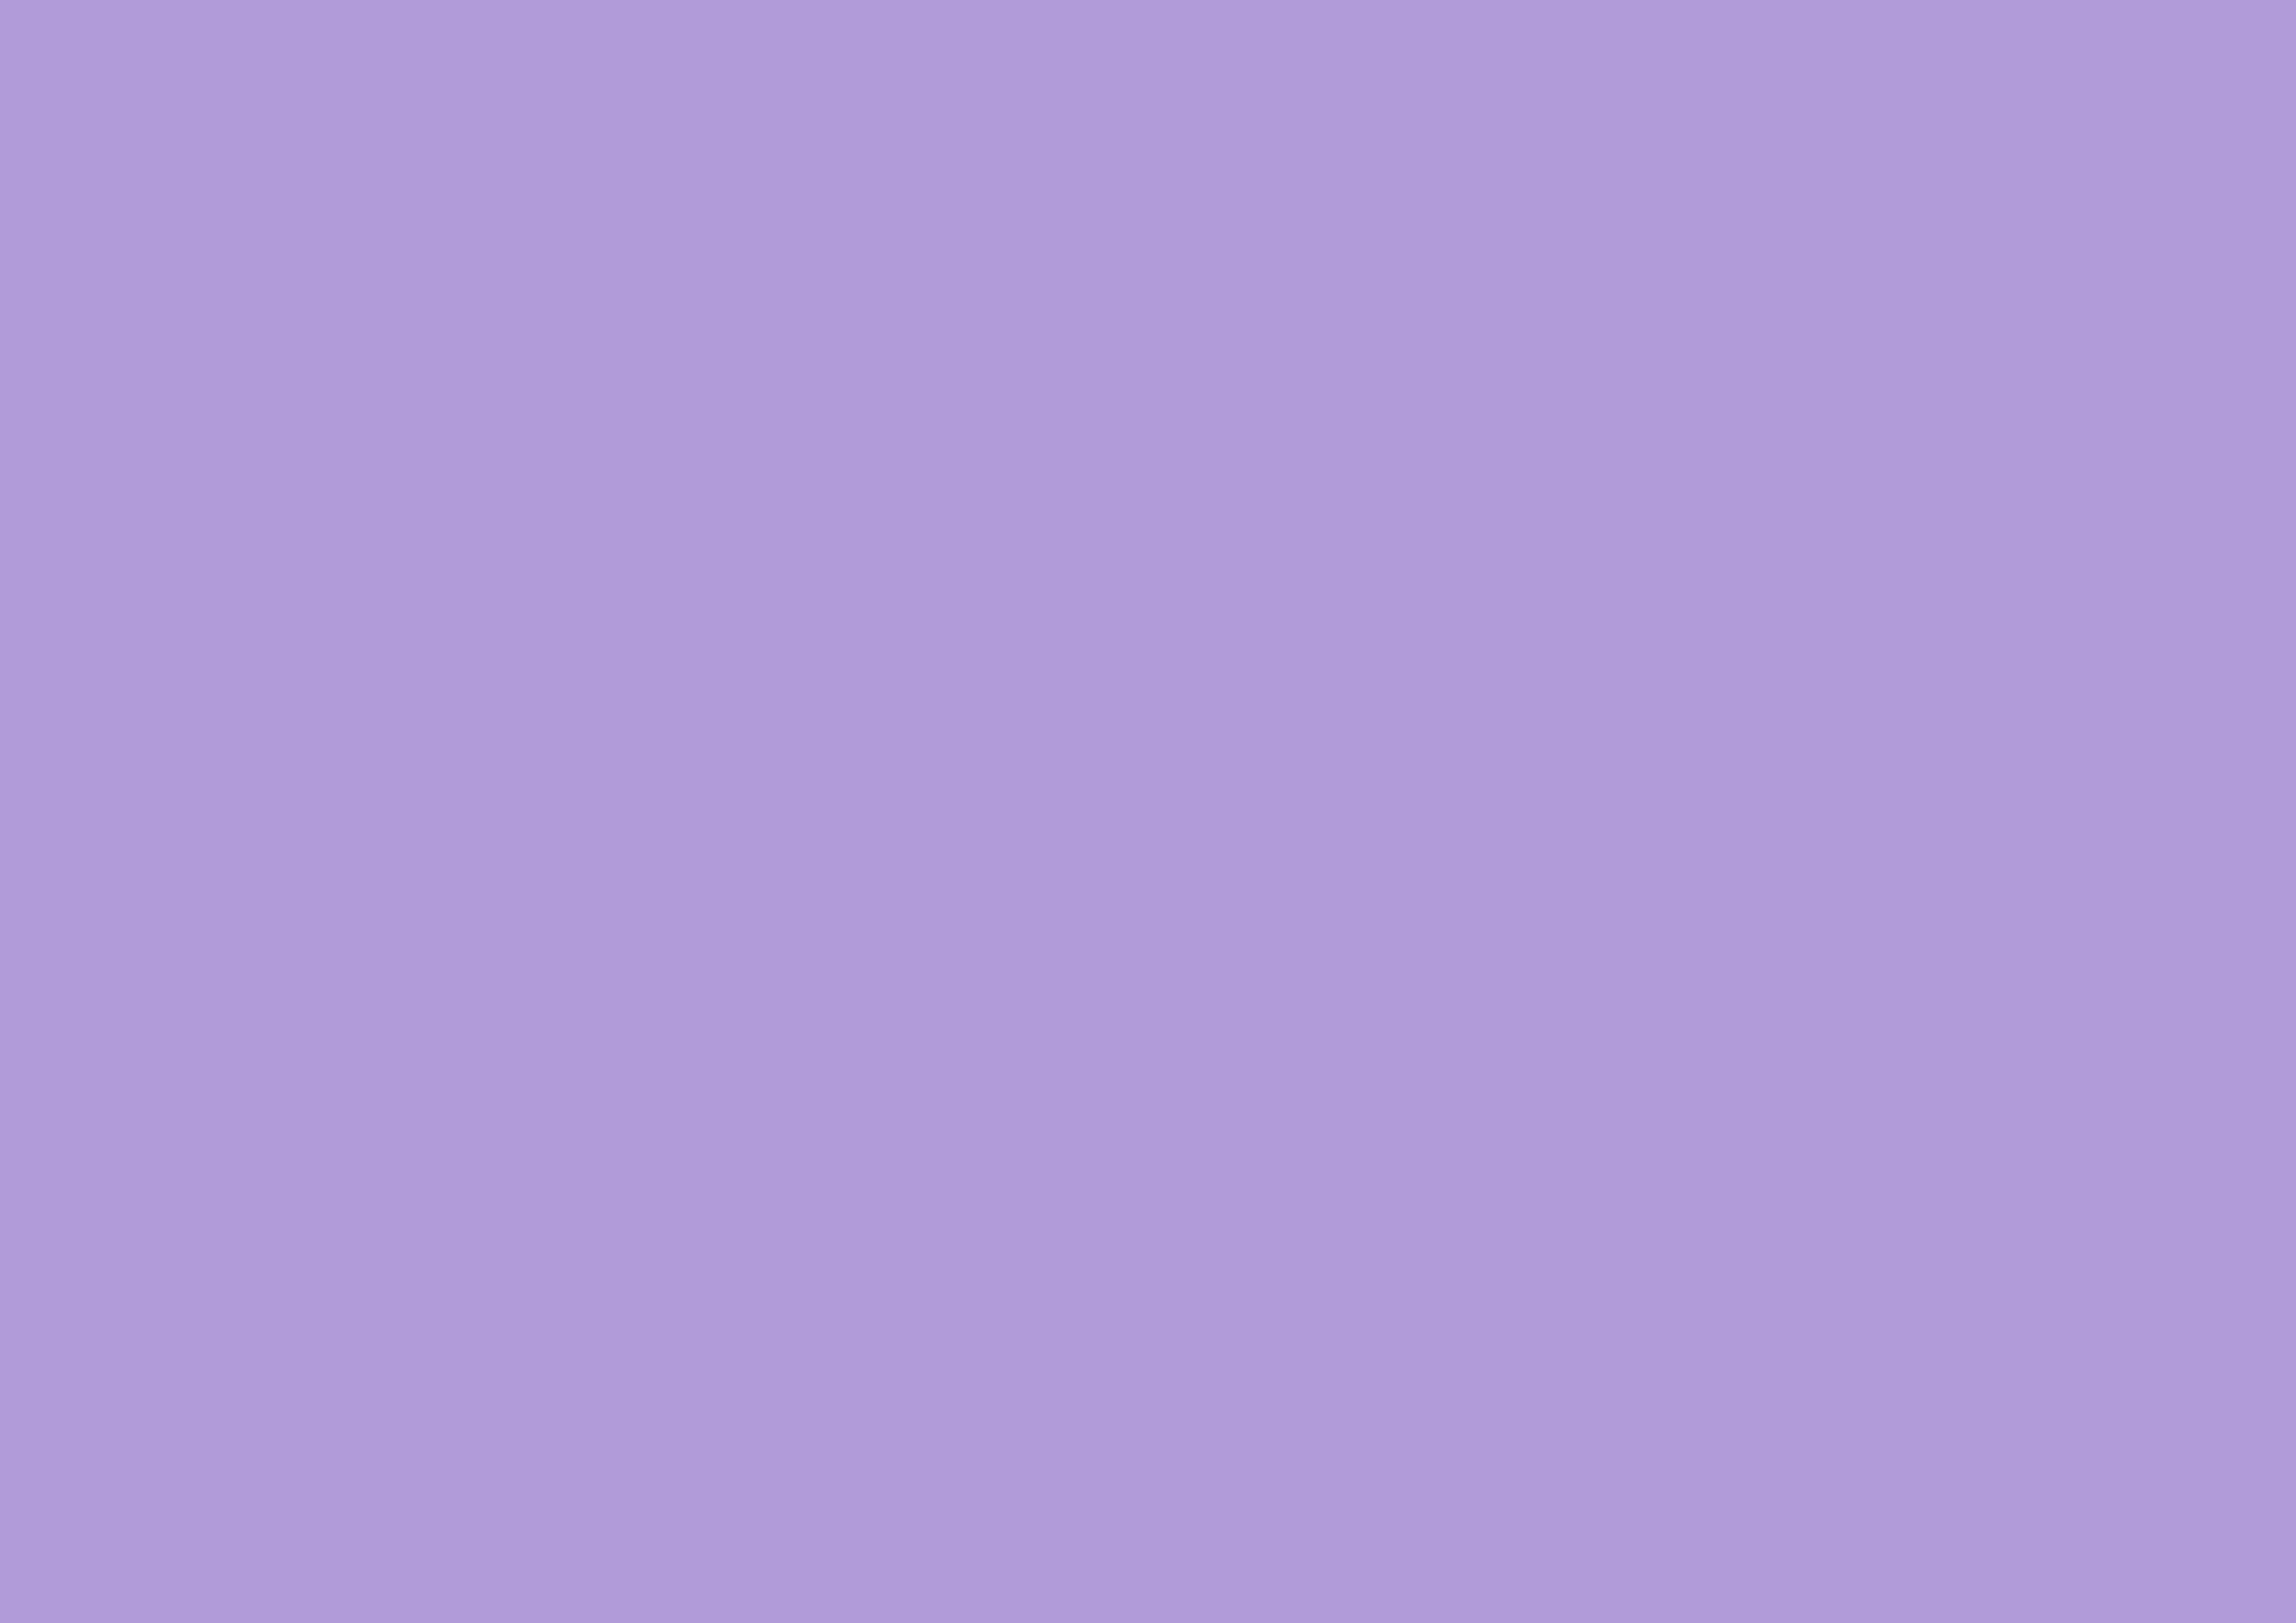 3508x2480 Light Pastel Purple Solid Color Background